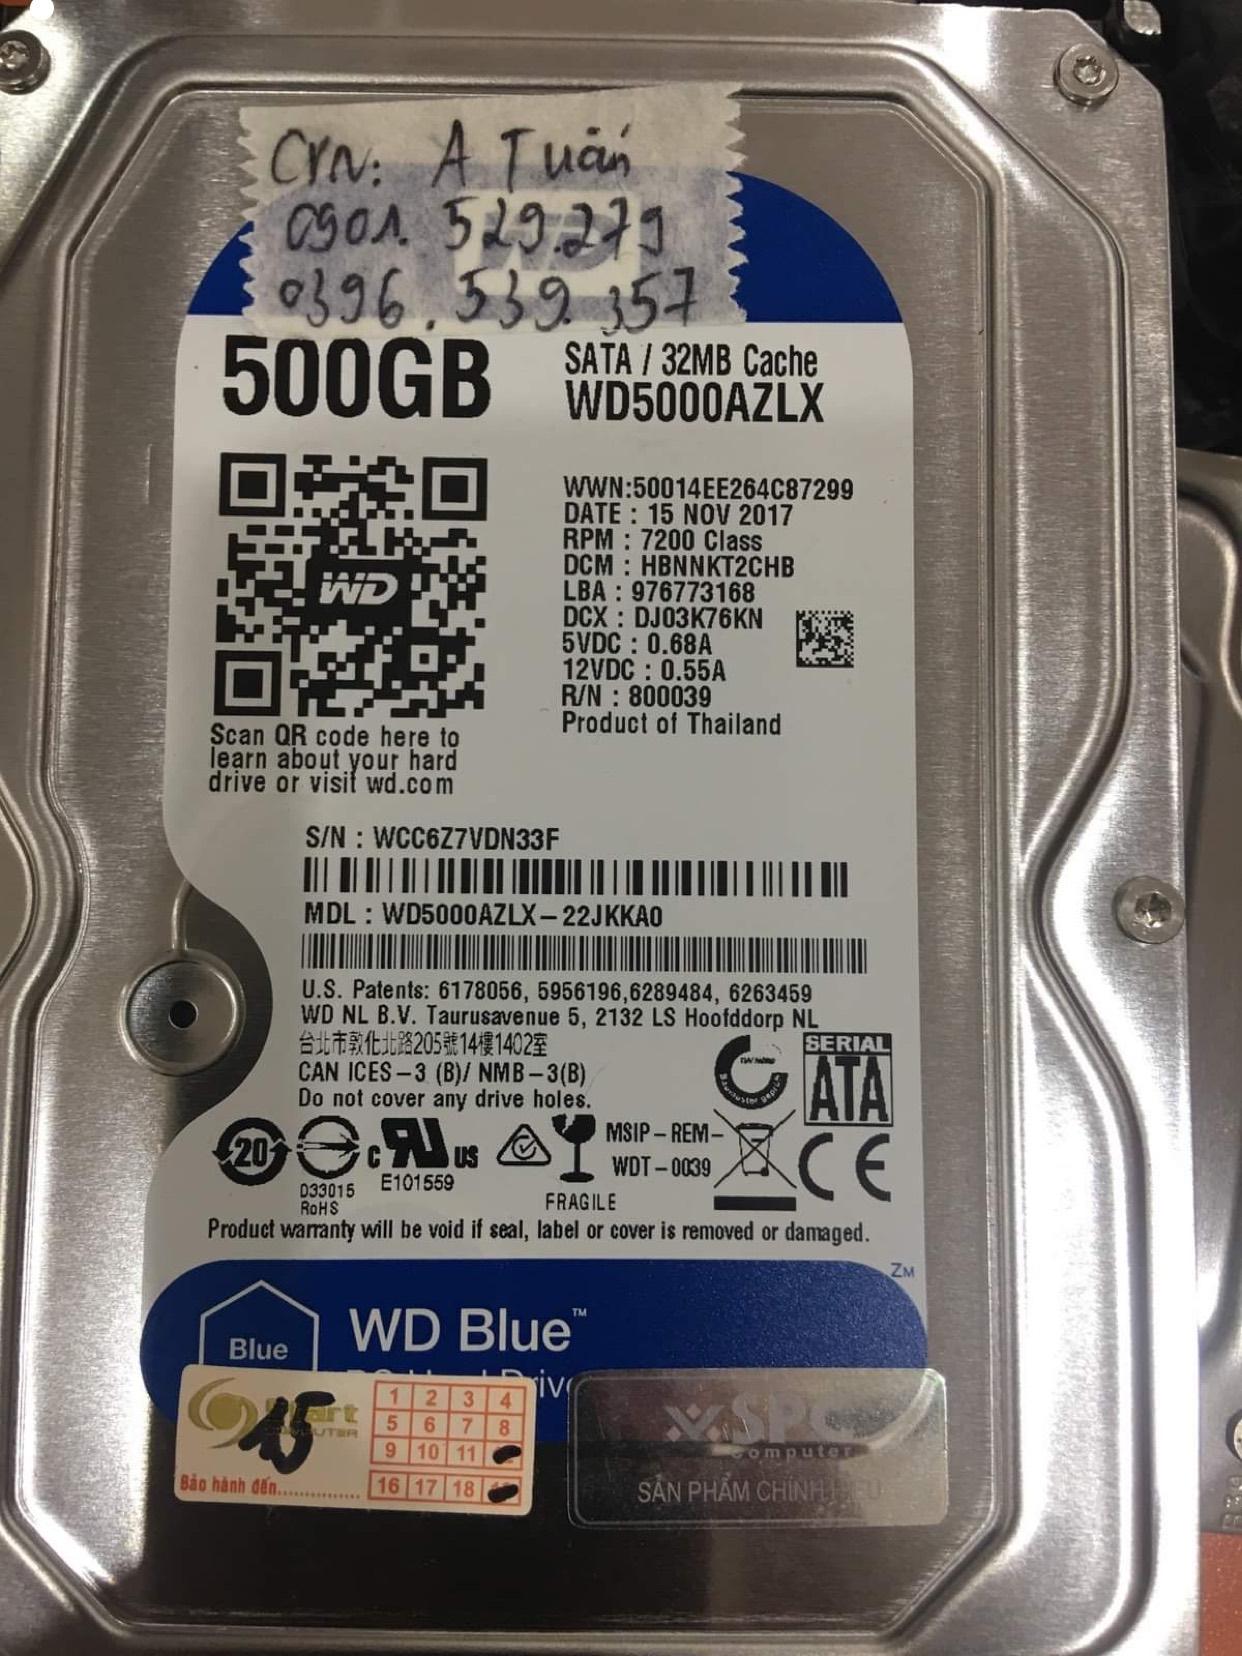 Khôi phục dữ liệu ổ cứng Western 500GB mất dữ liệu - 31/12/2020 - cuumaytinh